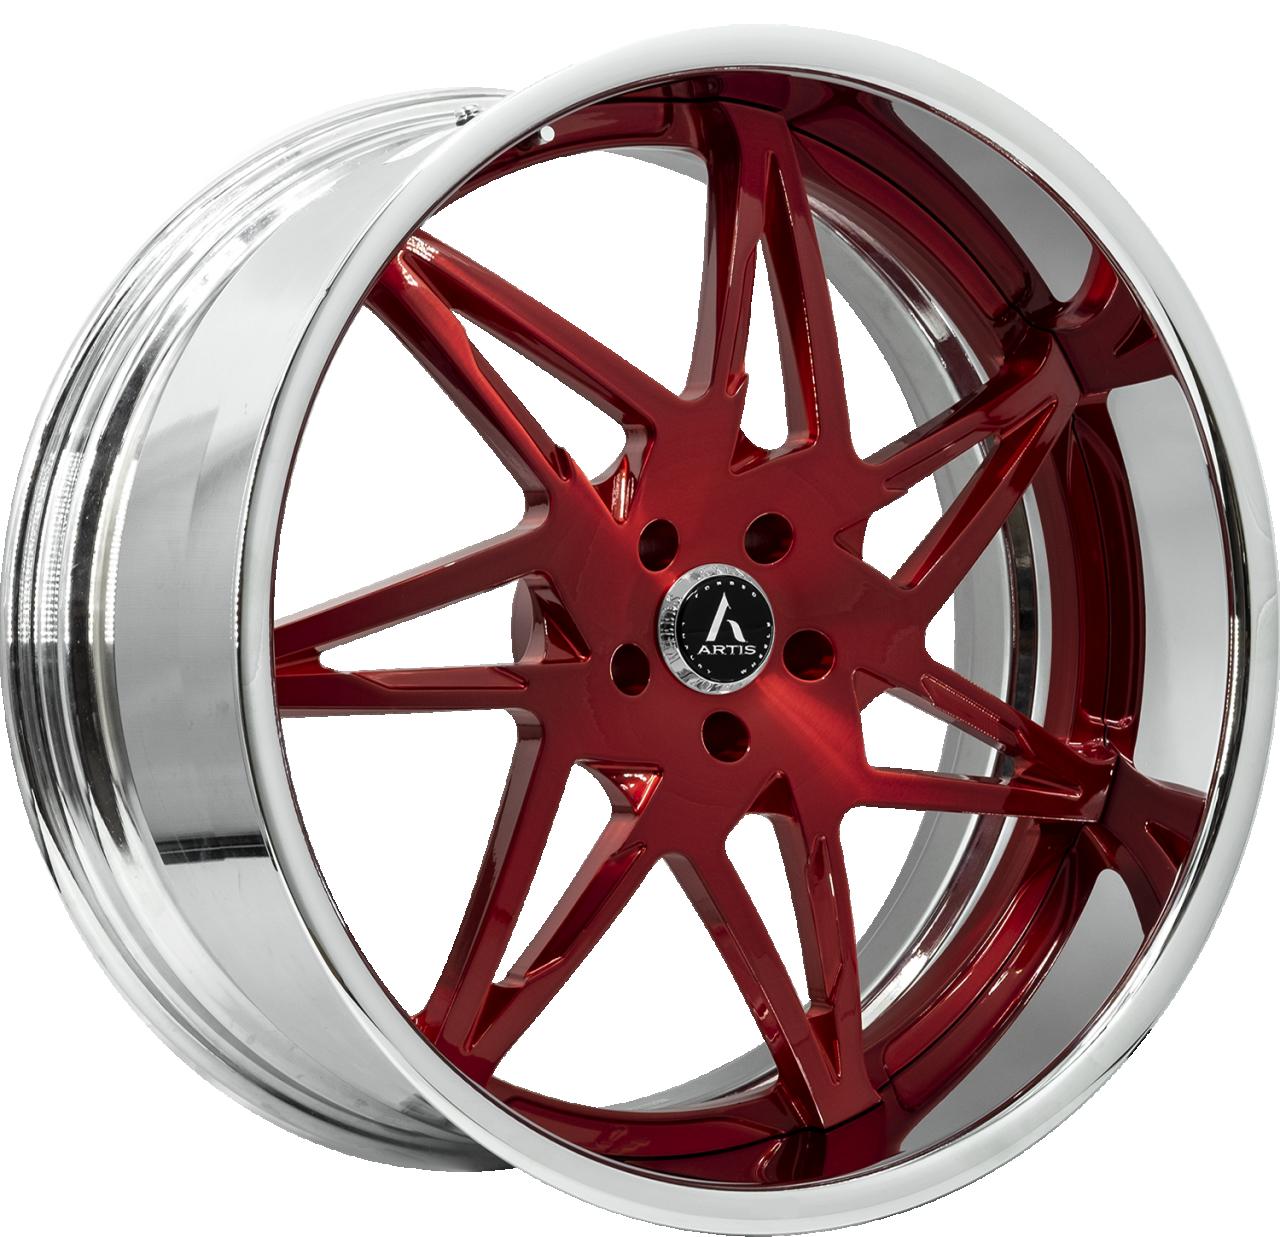 Artis Forged Nirvana wheel with Custom finish